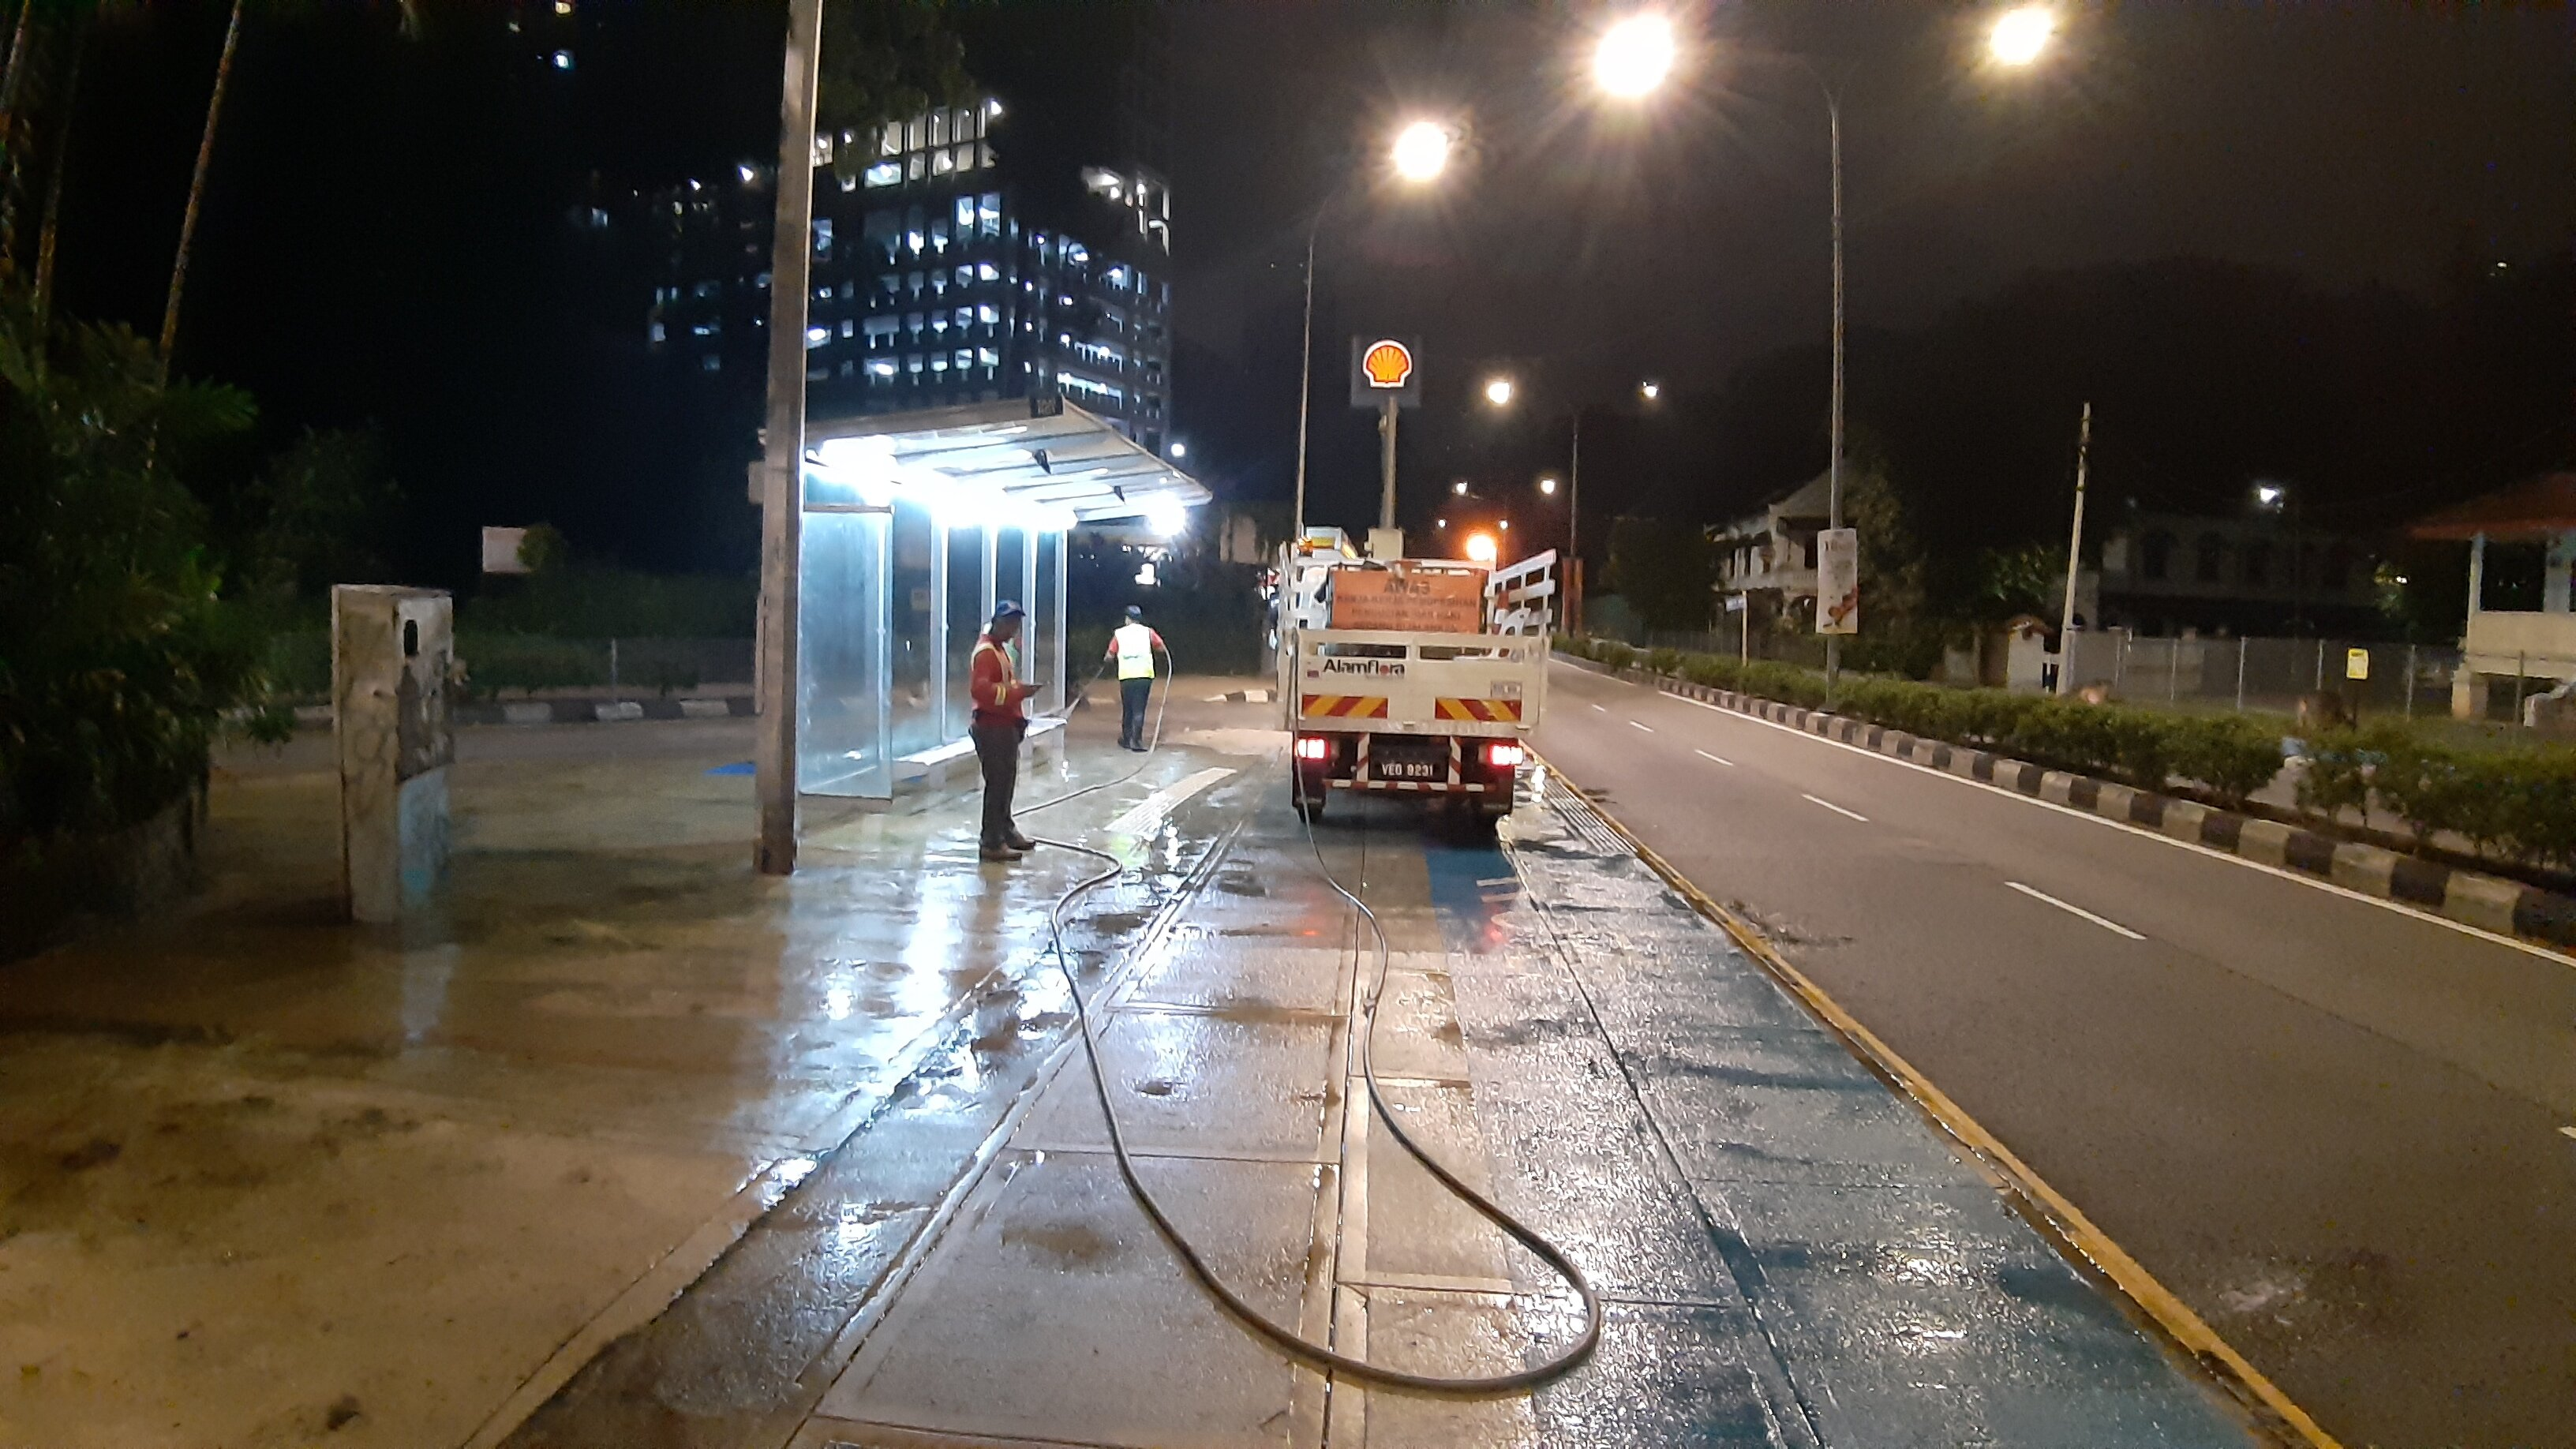 Trucks spraying water